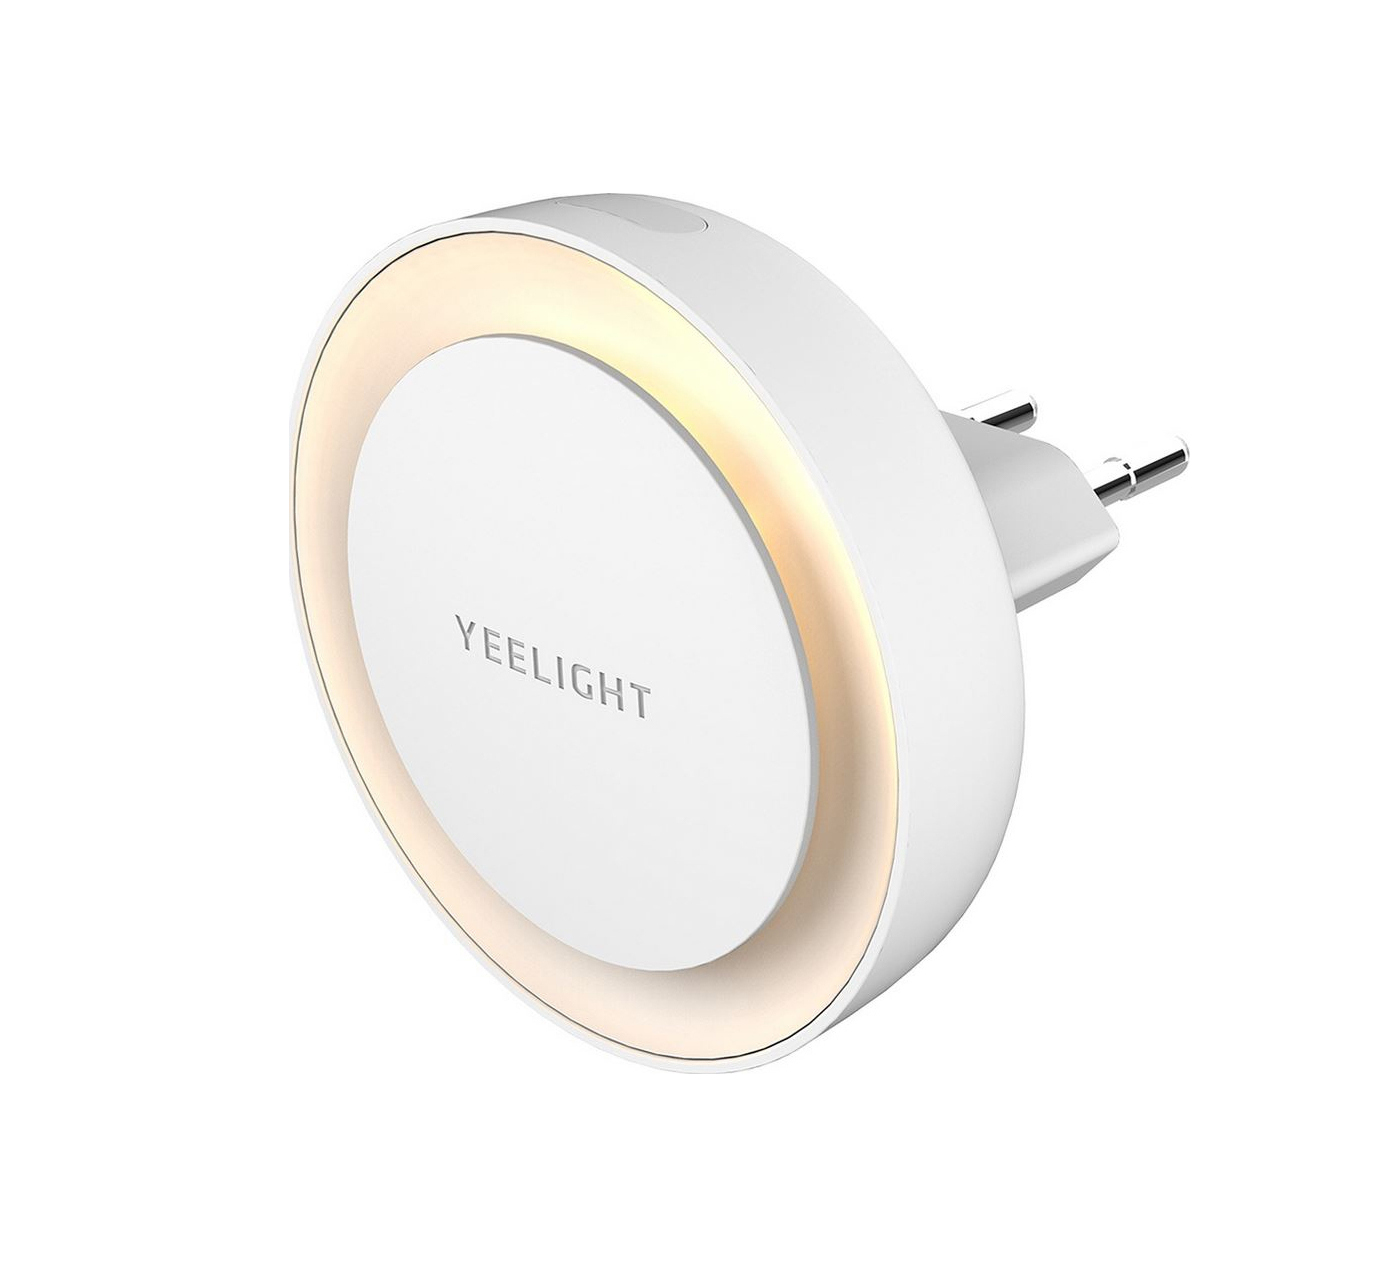 Yeelight Plug-in Light Sensor Nightlight 2500K 0.5W YLYD11YL (2 χρόνια εγγύηση)